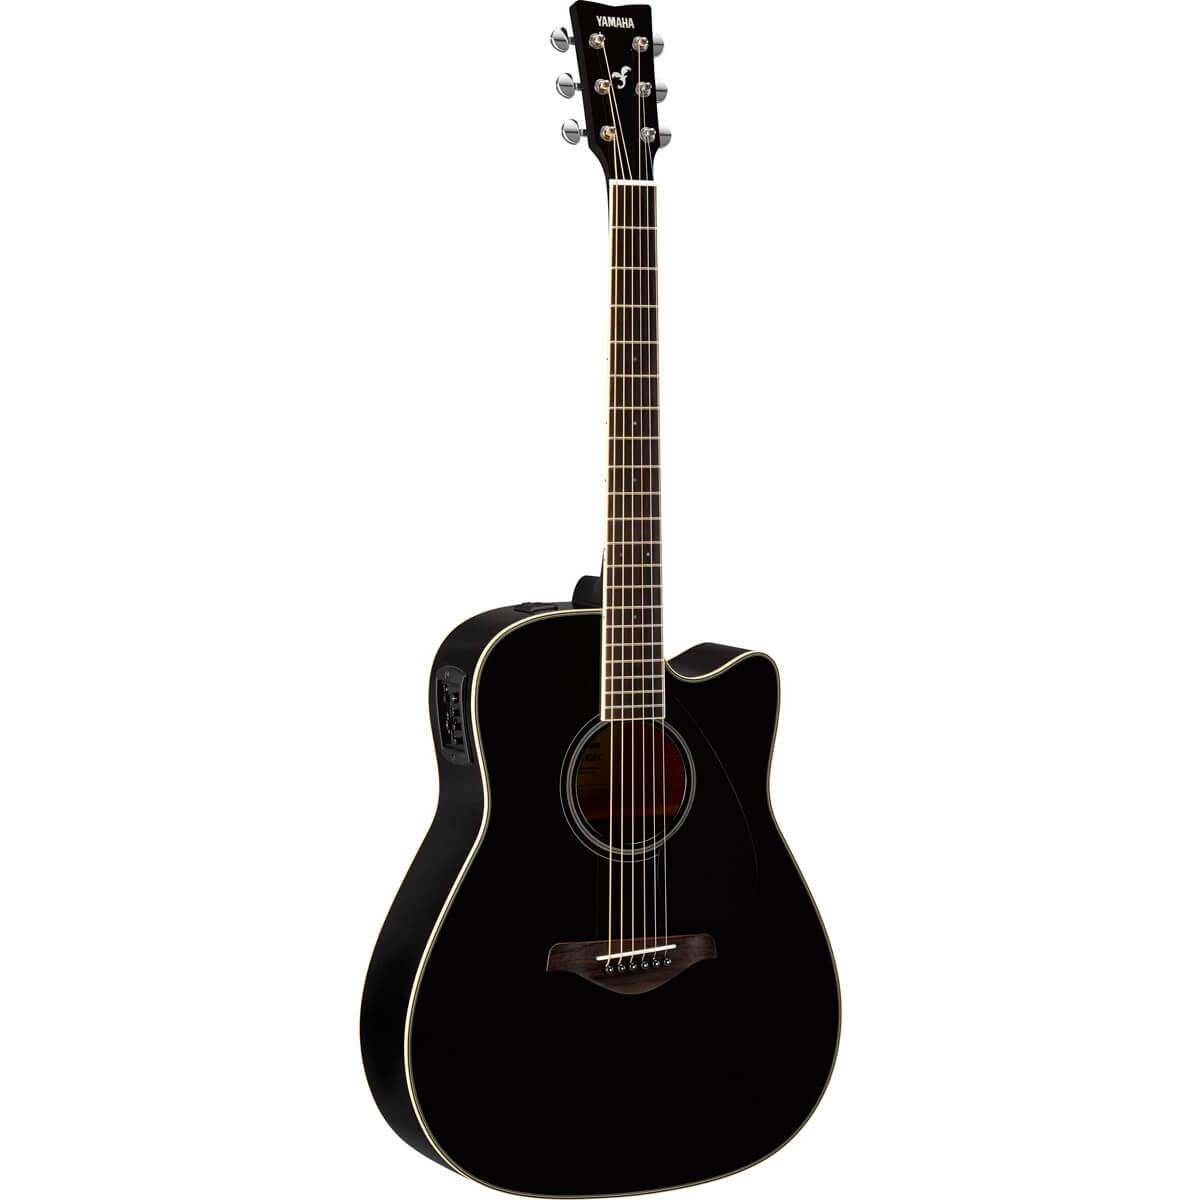 Yamaha FGX820CBL western-guitar sort